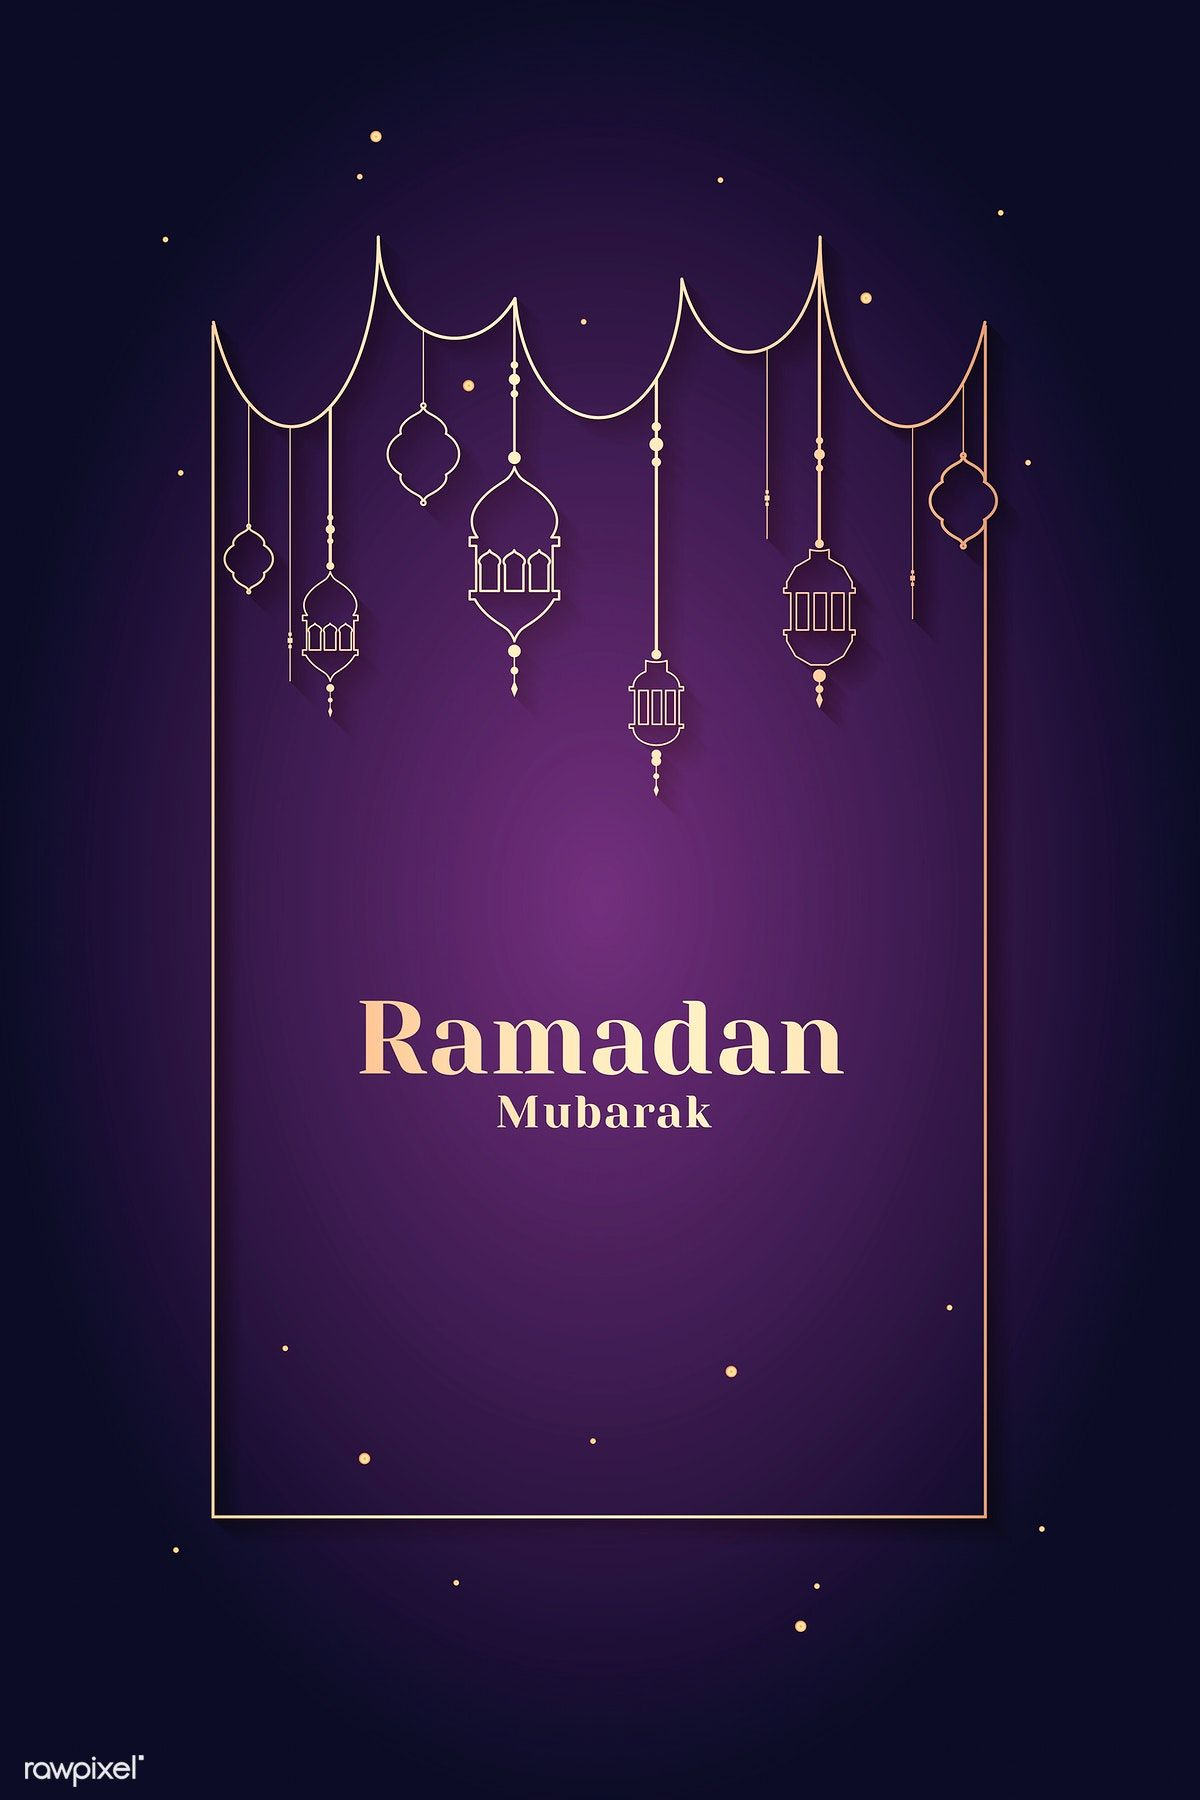 Ramadan Mubarak Frame With Lantern Vector Free Image By Rawpixel Com Vector Vectoart Digitalpainting Digitalartist Garphicdesign Sketch Digitaldrawing